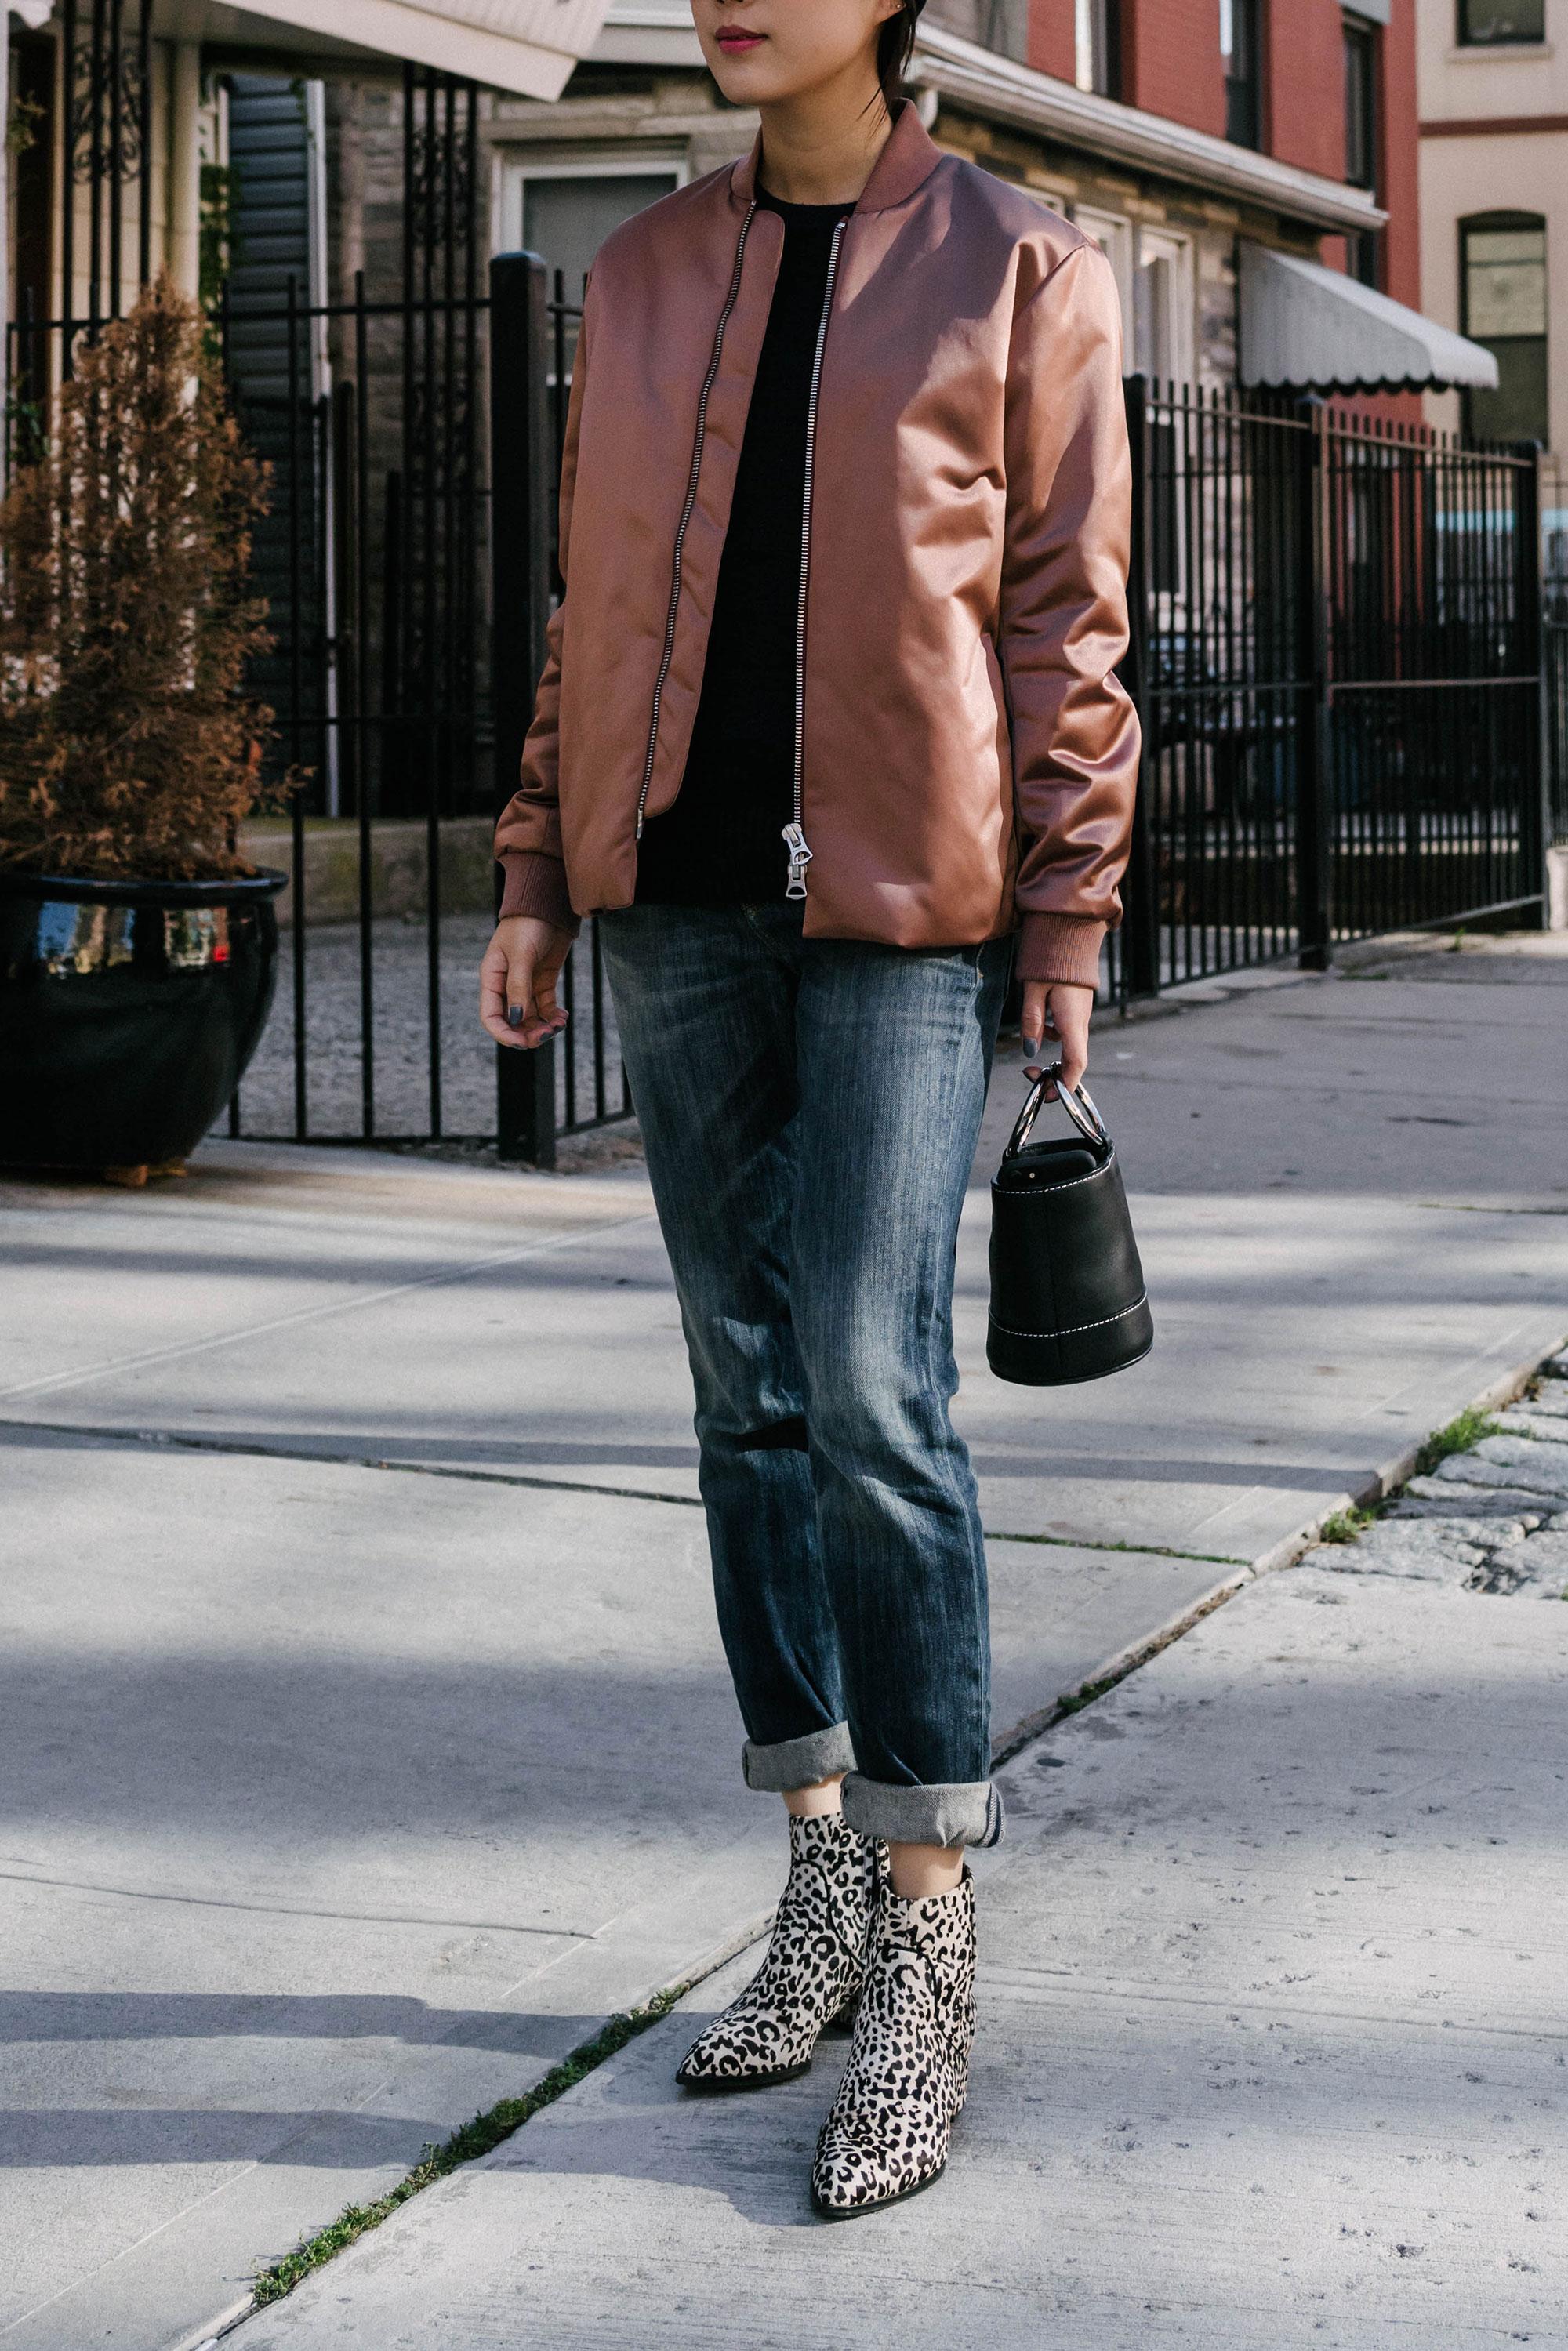 Acne Studios Jacket,  R13 Denim , Senso Boots, Simon Miller Bag ( bigger size )